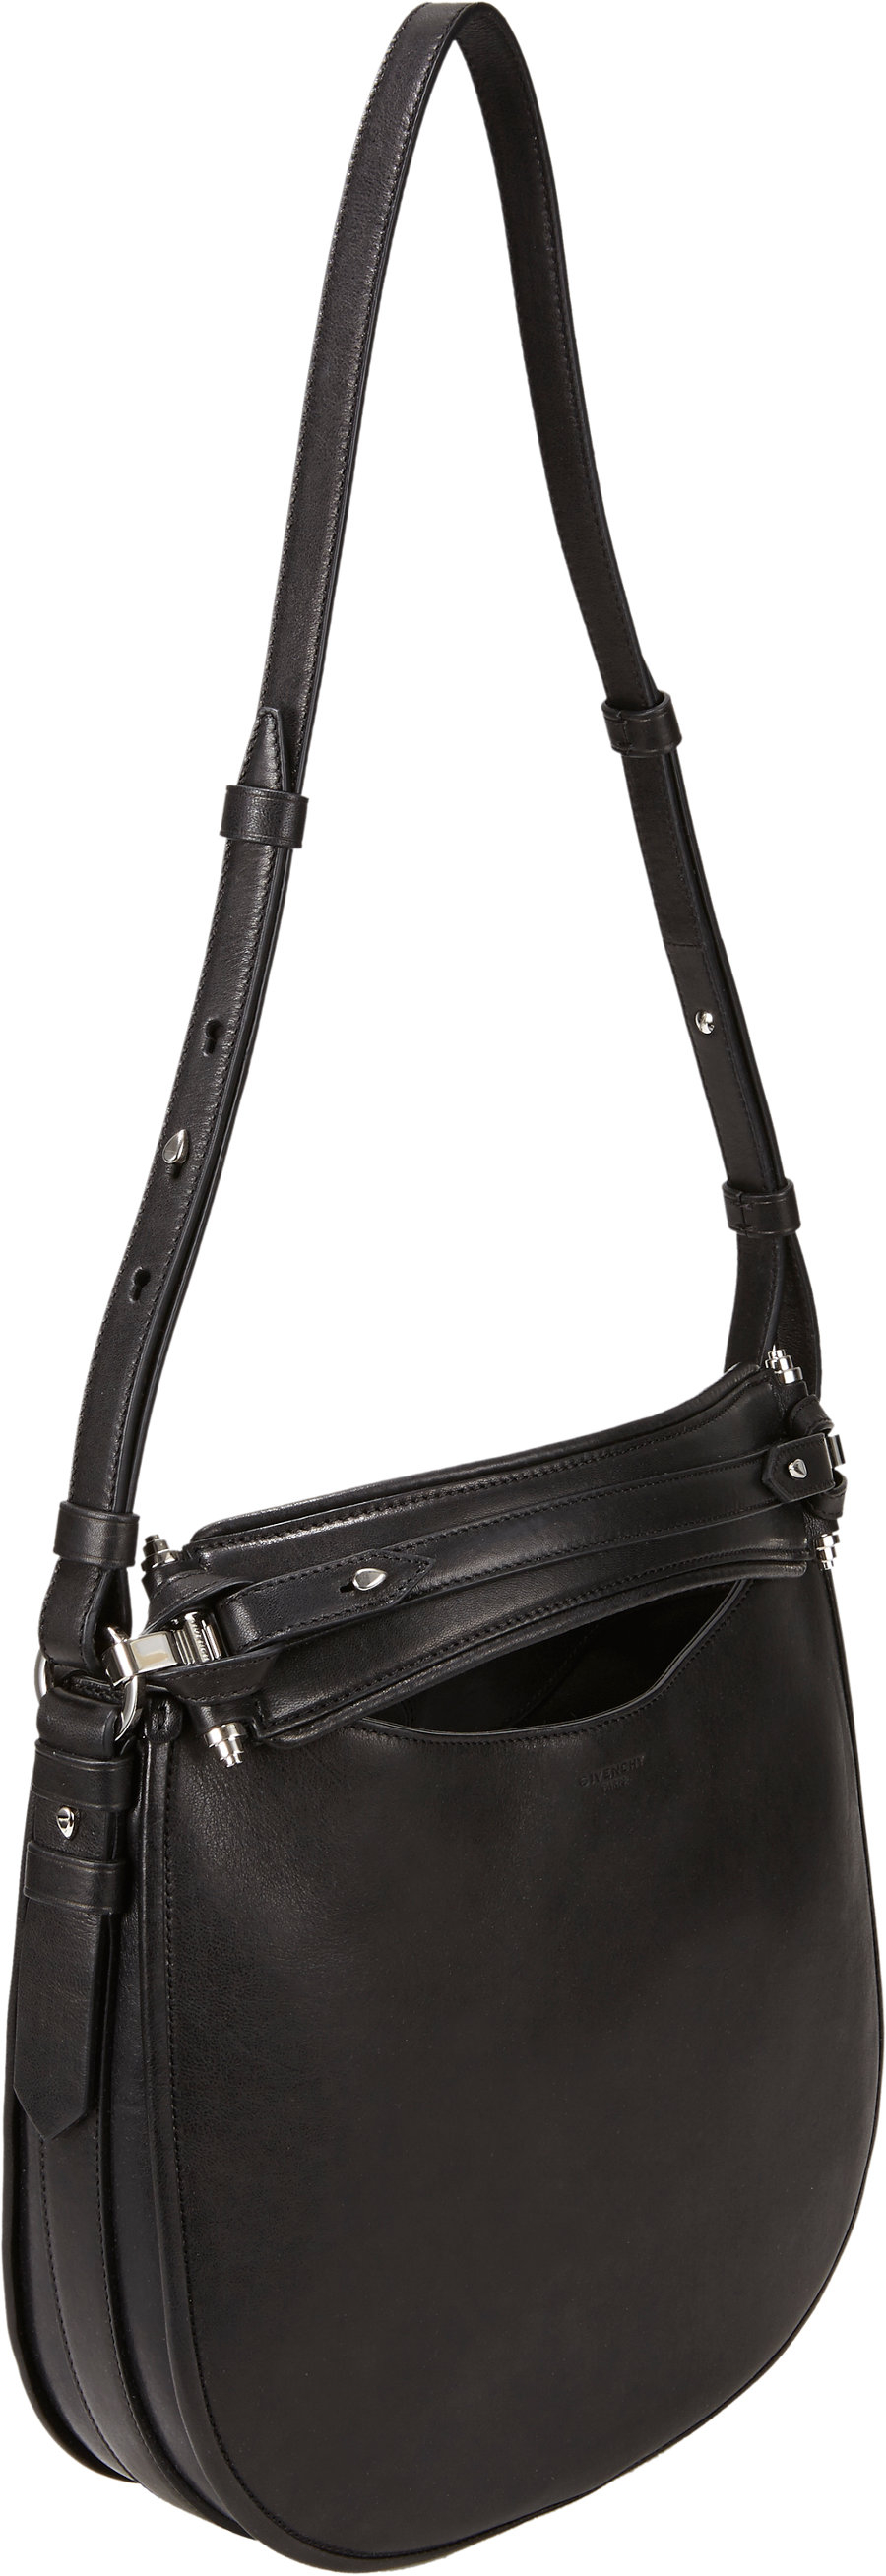 Lyst - Givenchy Small Zanzi Obsedia Hobo Bag in Black 9c41b6214a